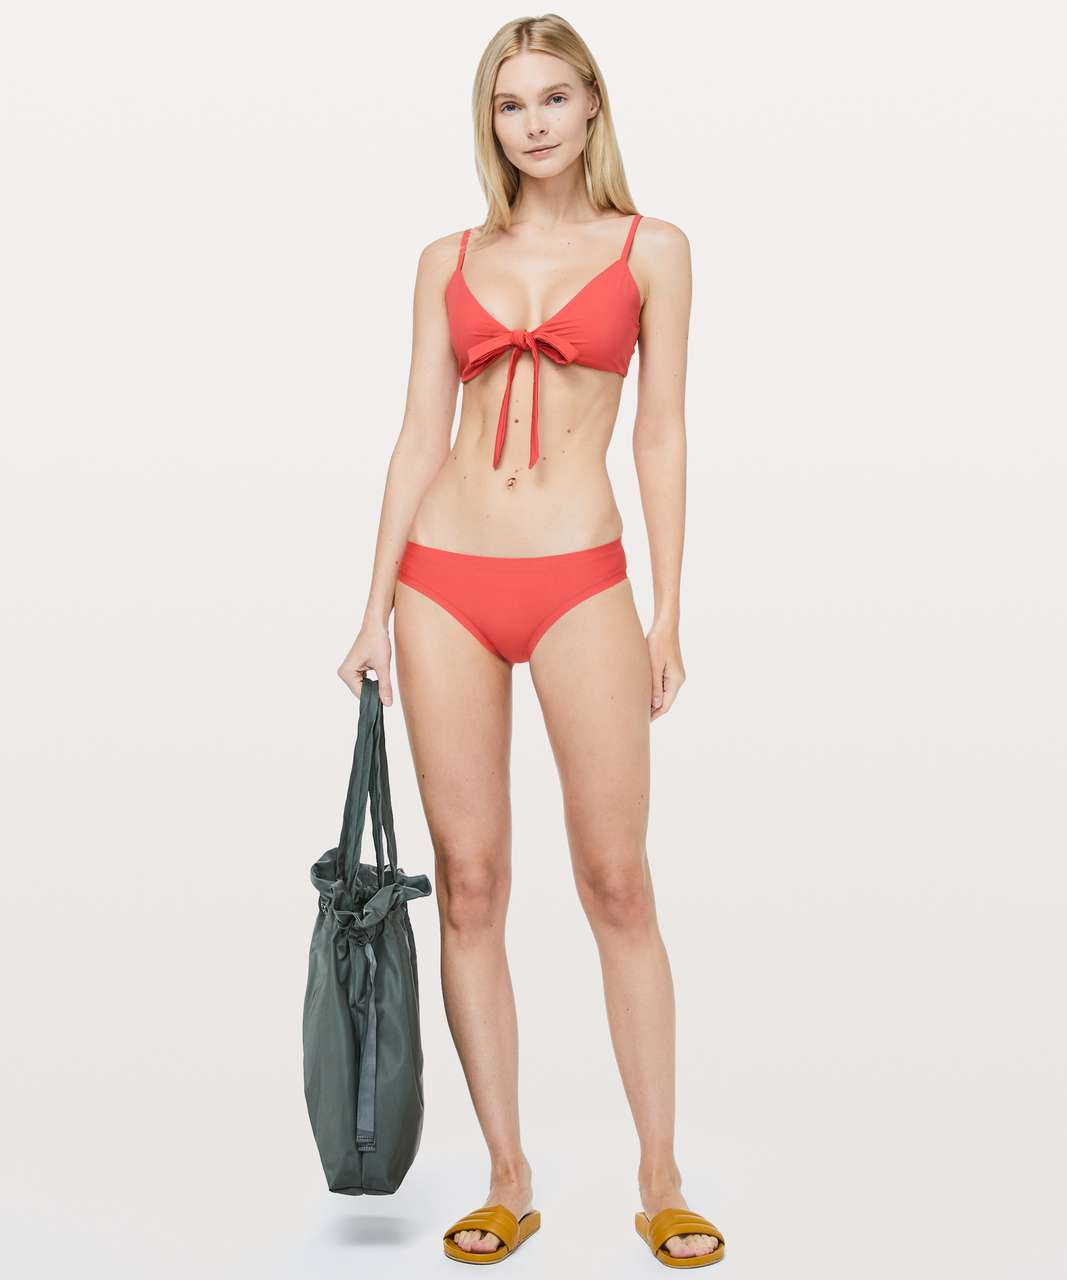 Lululemon Tied To Tide Swim Top - Poppy Coral